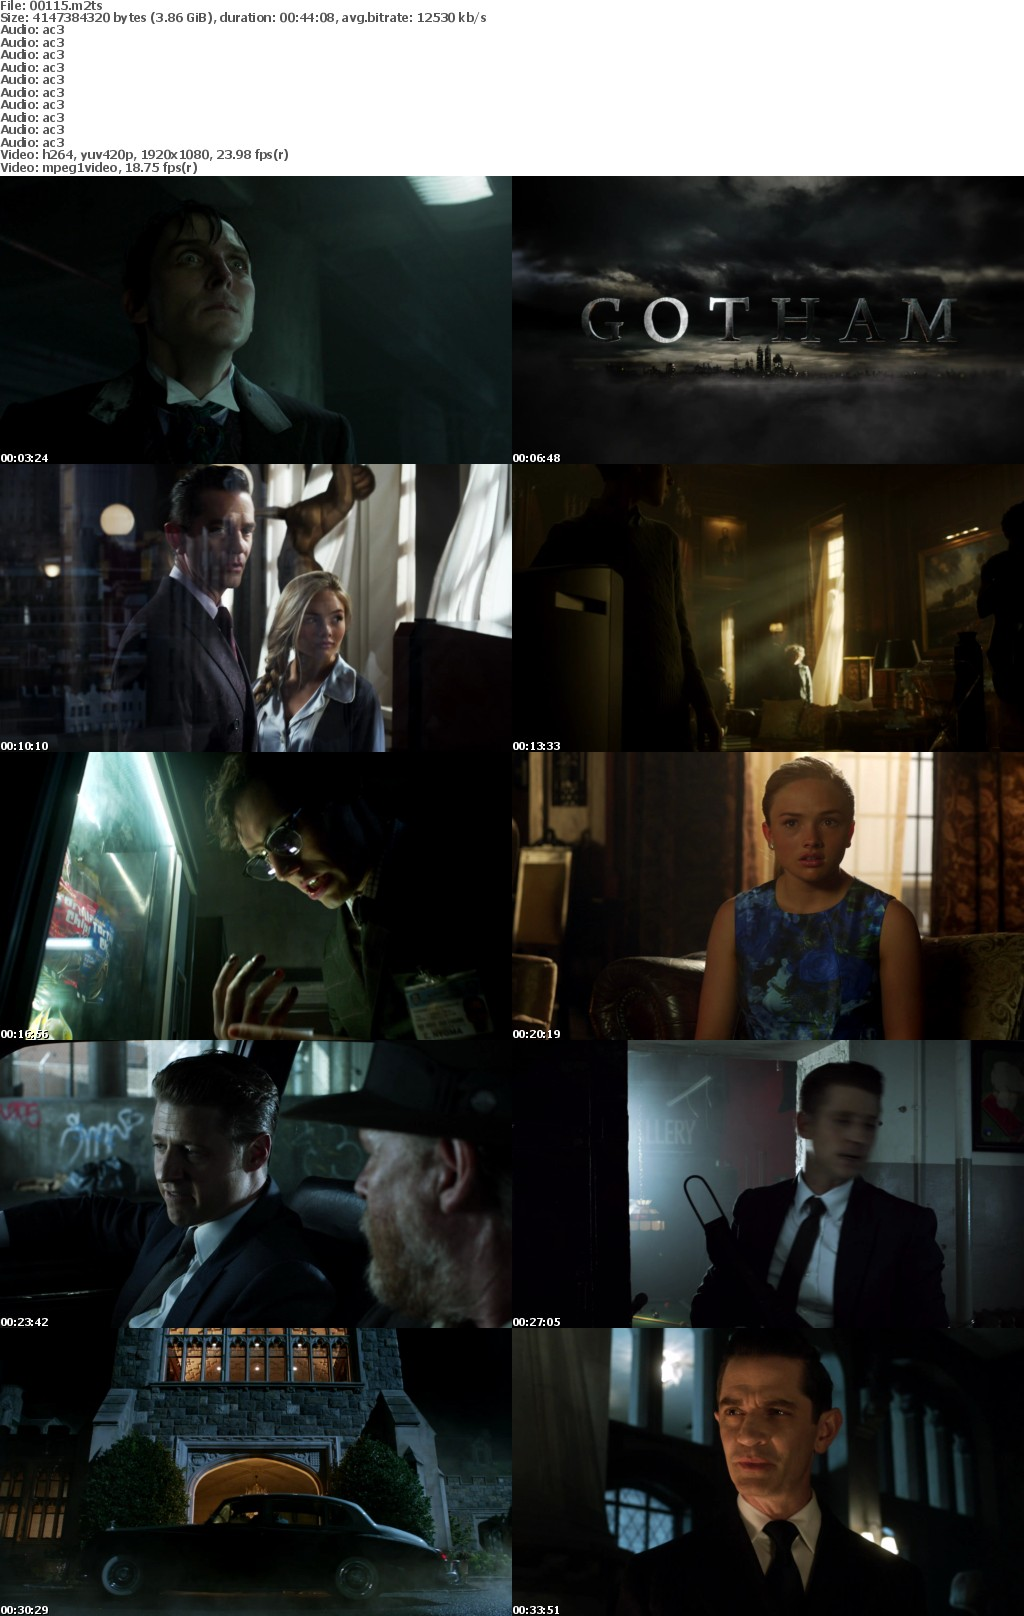 Gotham S02 D02 BD25 Re-Encoded 1080p EUR Blu-ray AVC DTS-HD MA 5 1-SLHD